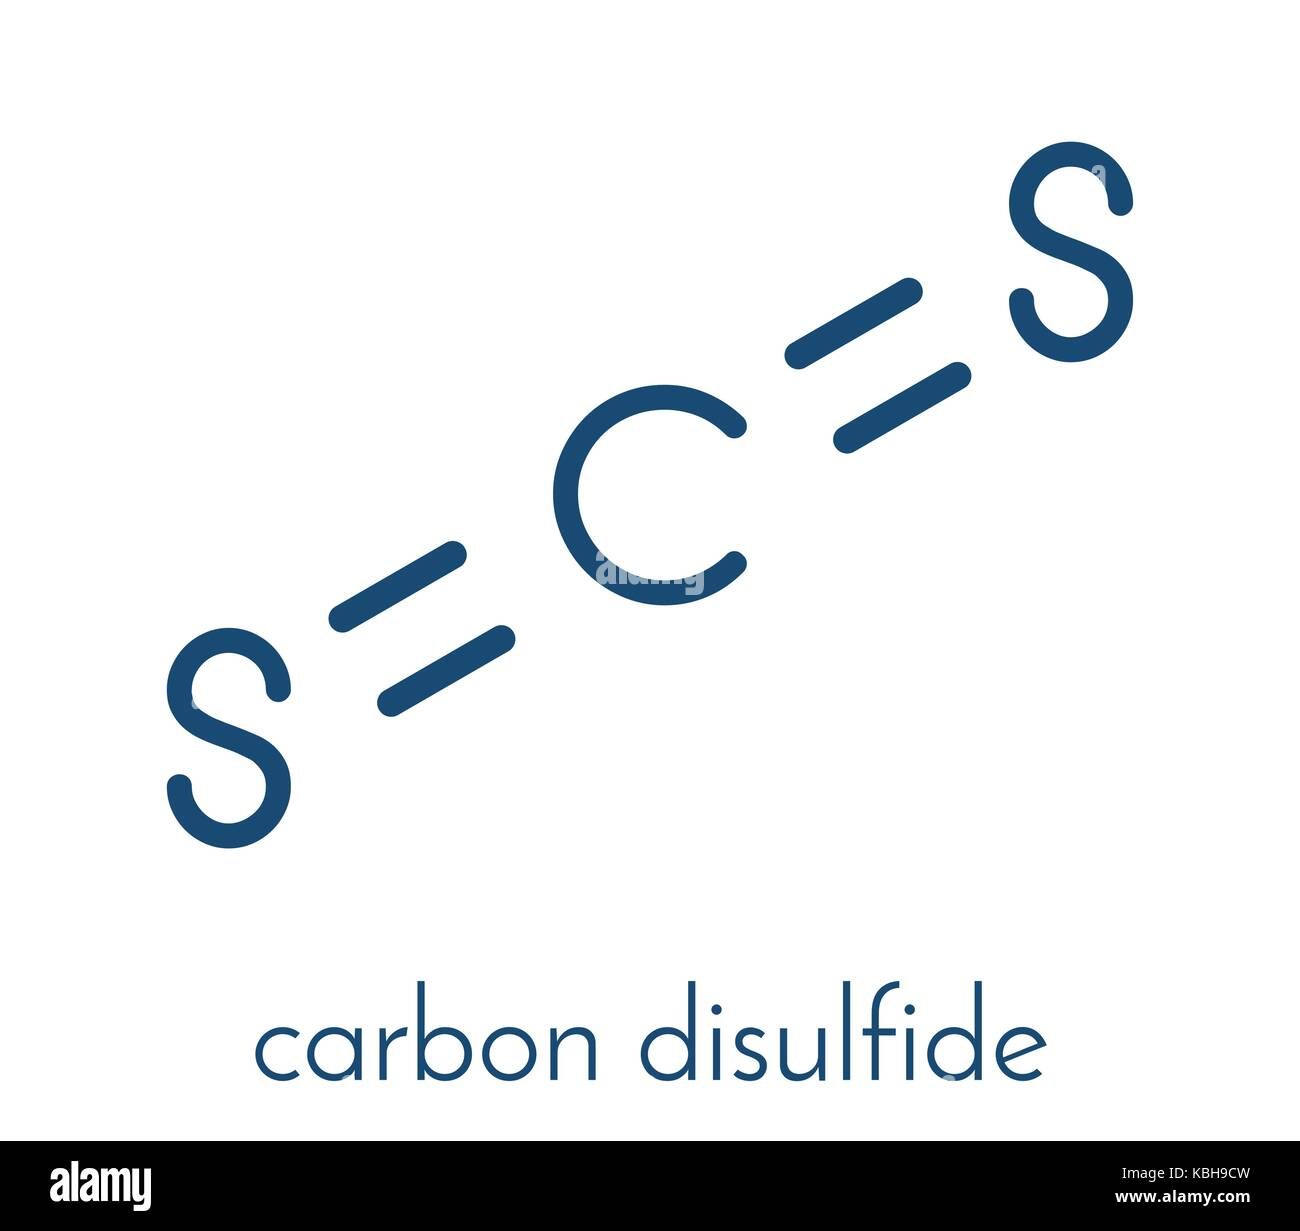 Carbon Disulfide Stock Photos Carbon Disulfide Stock Images Alamy